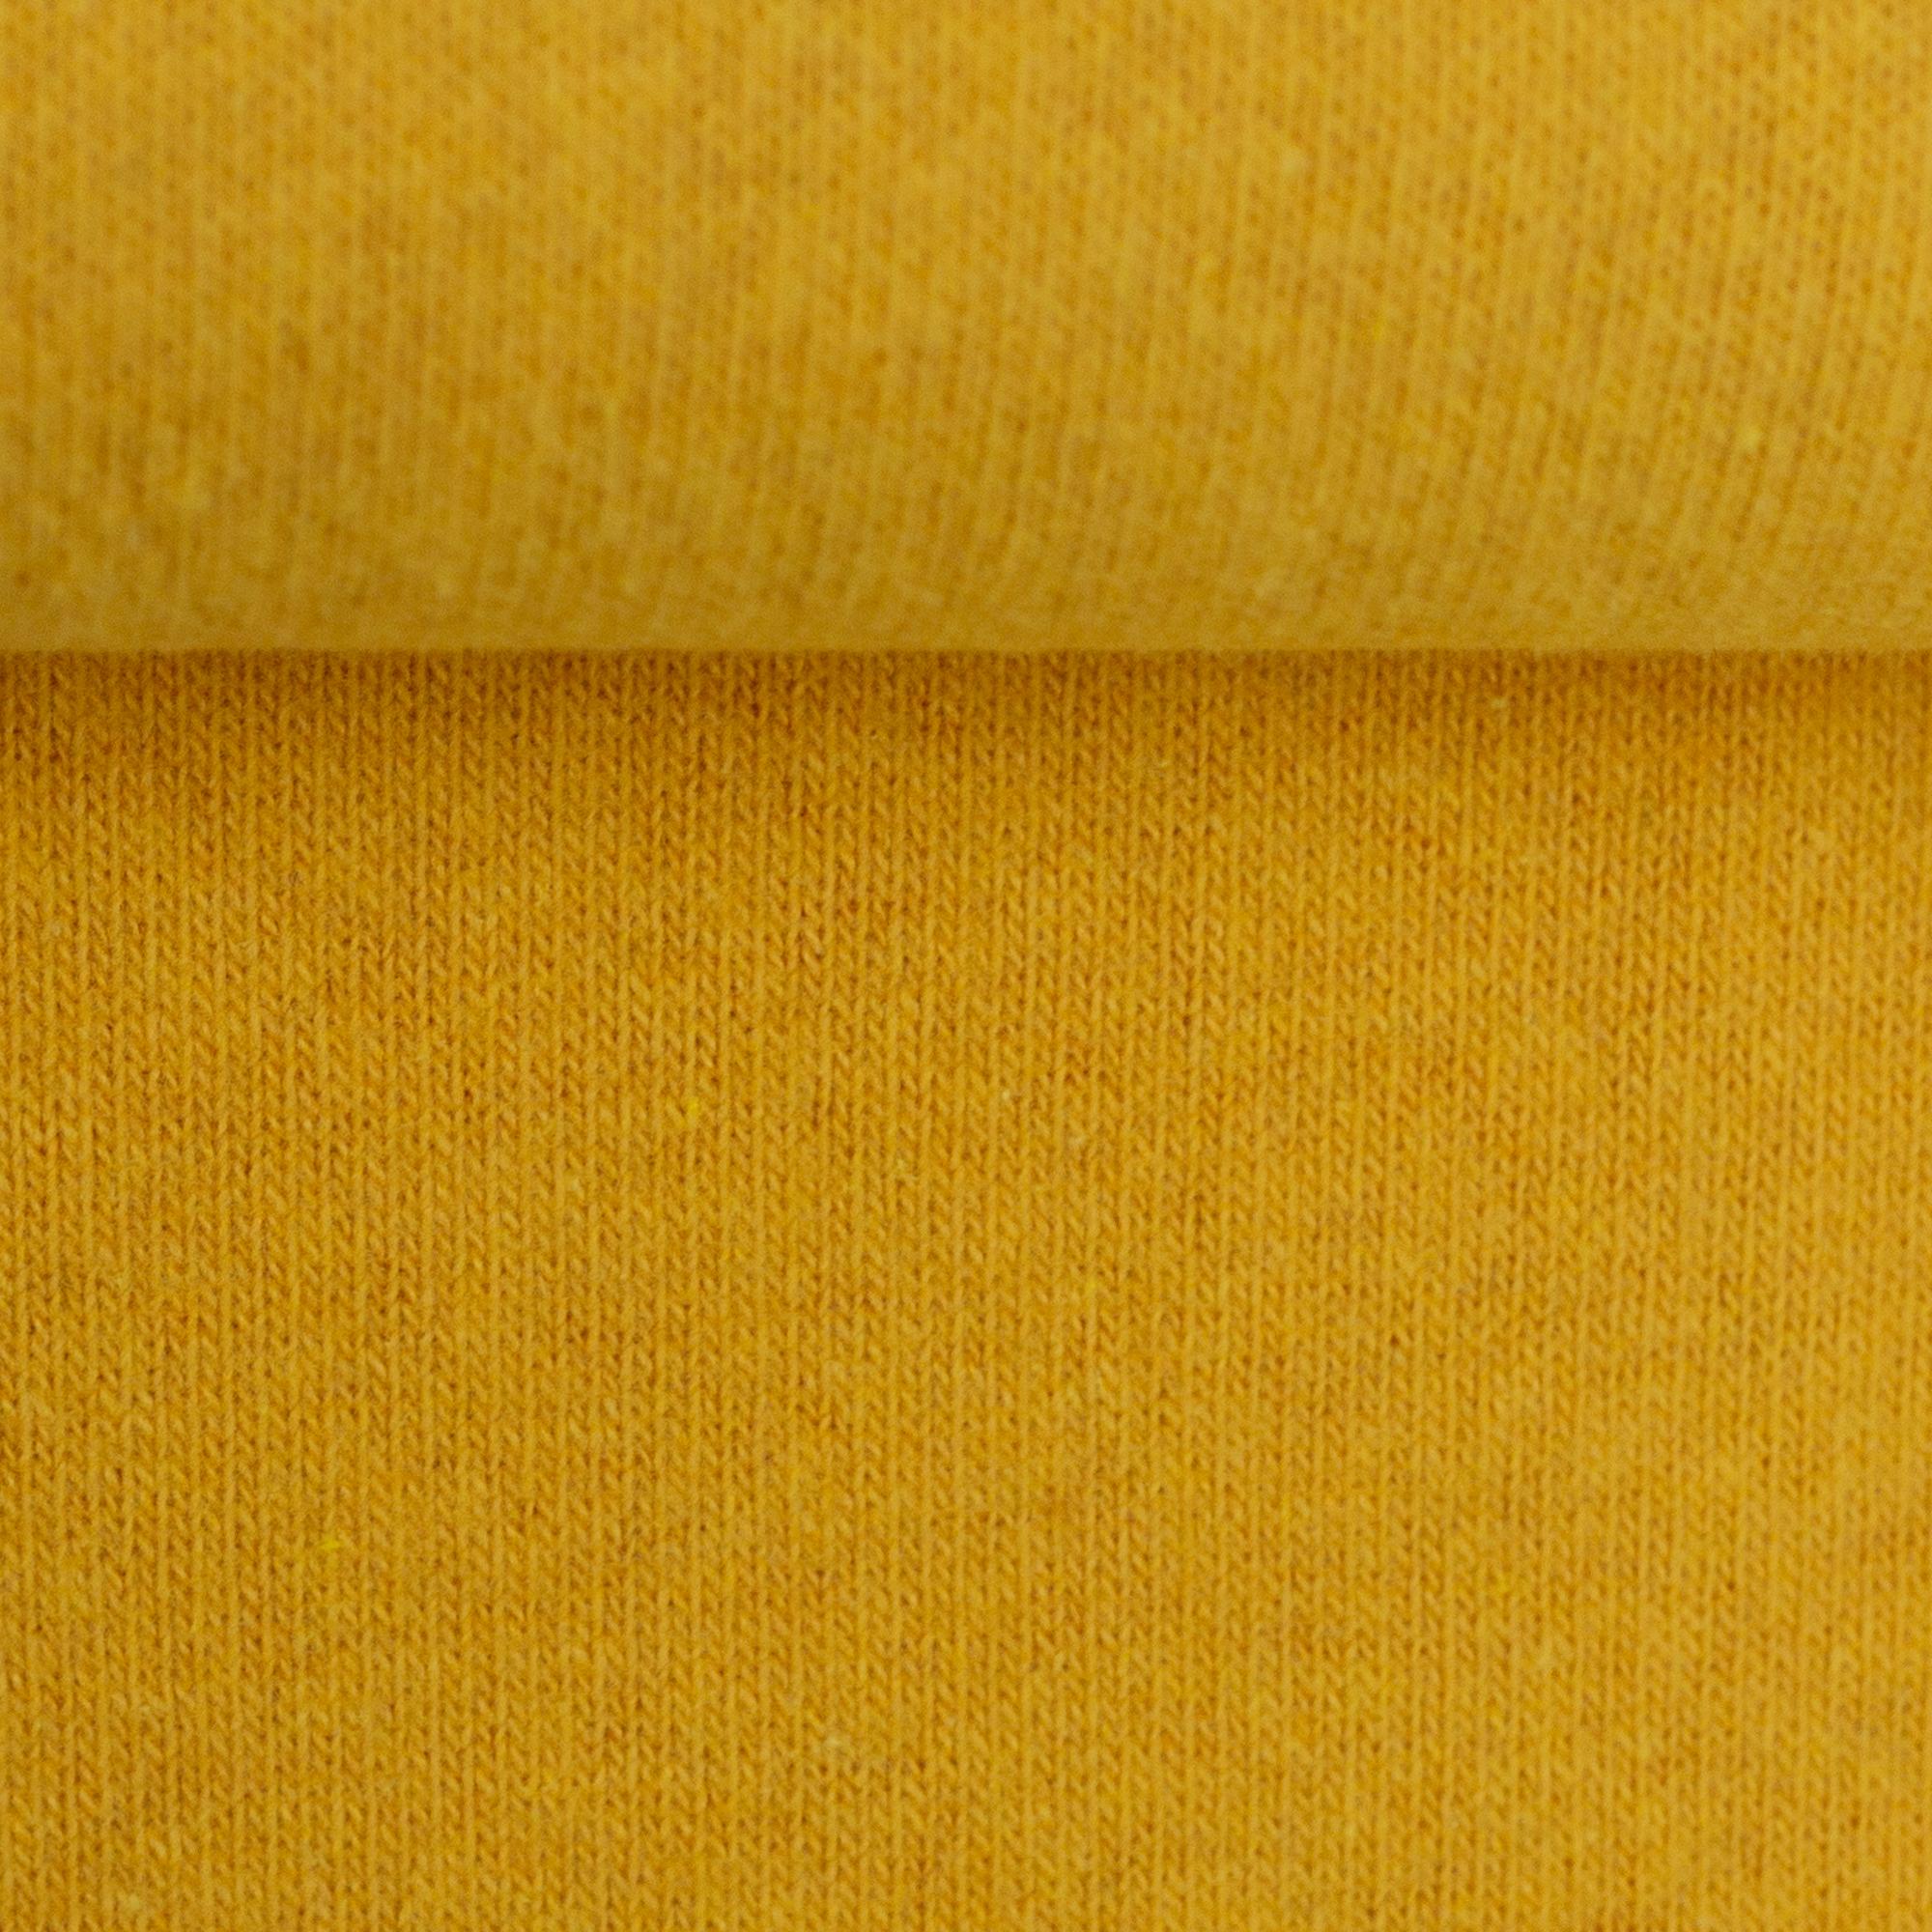 Strickstoff - Baumwollstrick - Swafing - Bono - Gelb